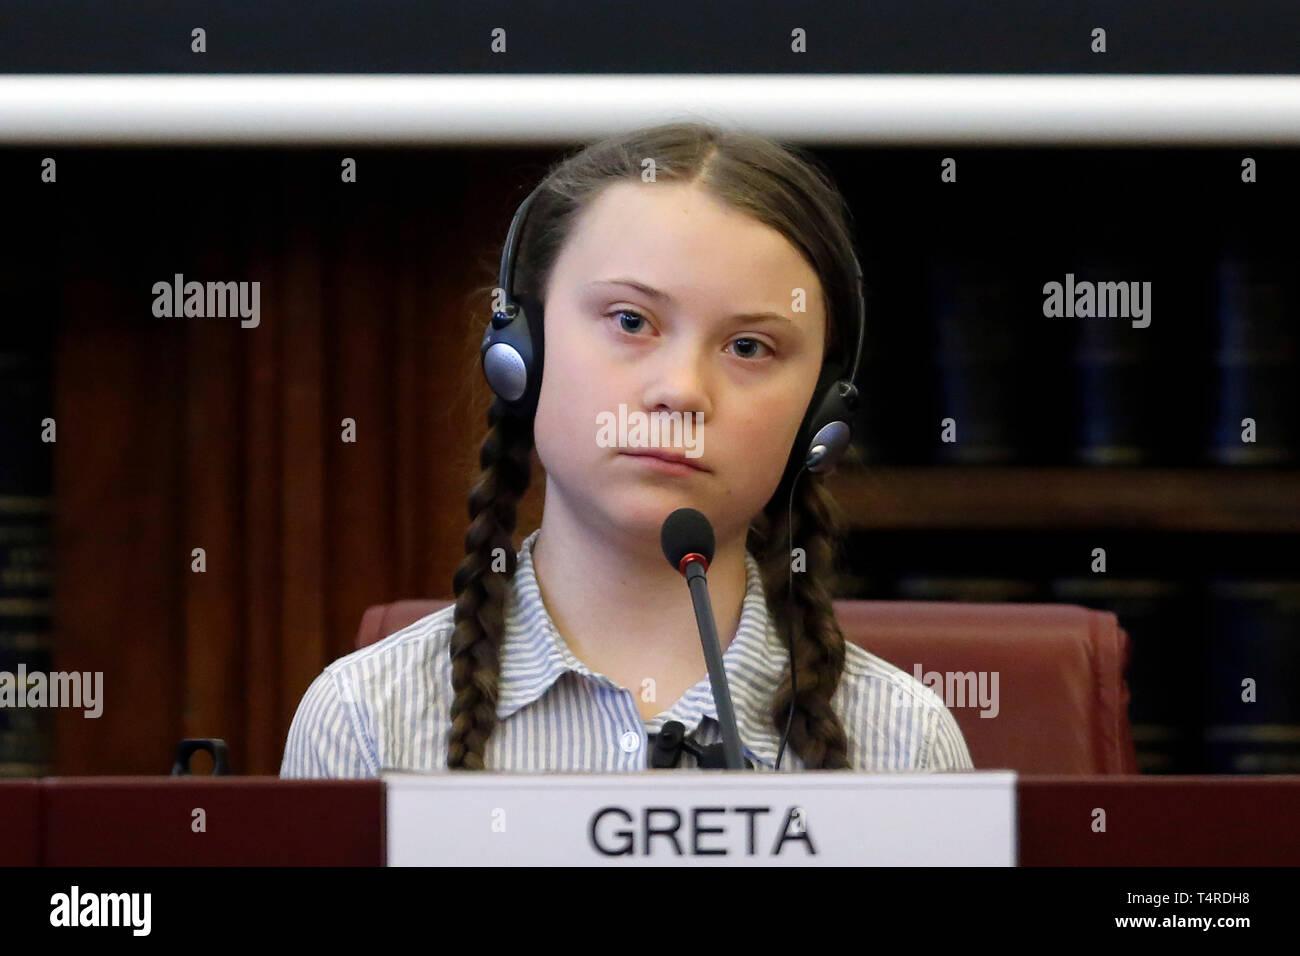 Roma, Italia. 18 abr, 2019. Greta Thunberg Roma 18 de abril de 2019. Teen activista climático Greta Thunberg participa en un seminario sobre el clima en el Senado italiano. Foto di Samantha Zucchi/Insidefoto Crédito: insidefoto srl/Alamy Live News Imagen De Stock